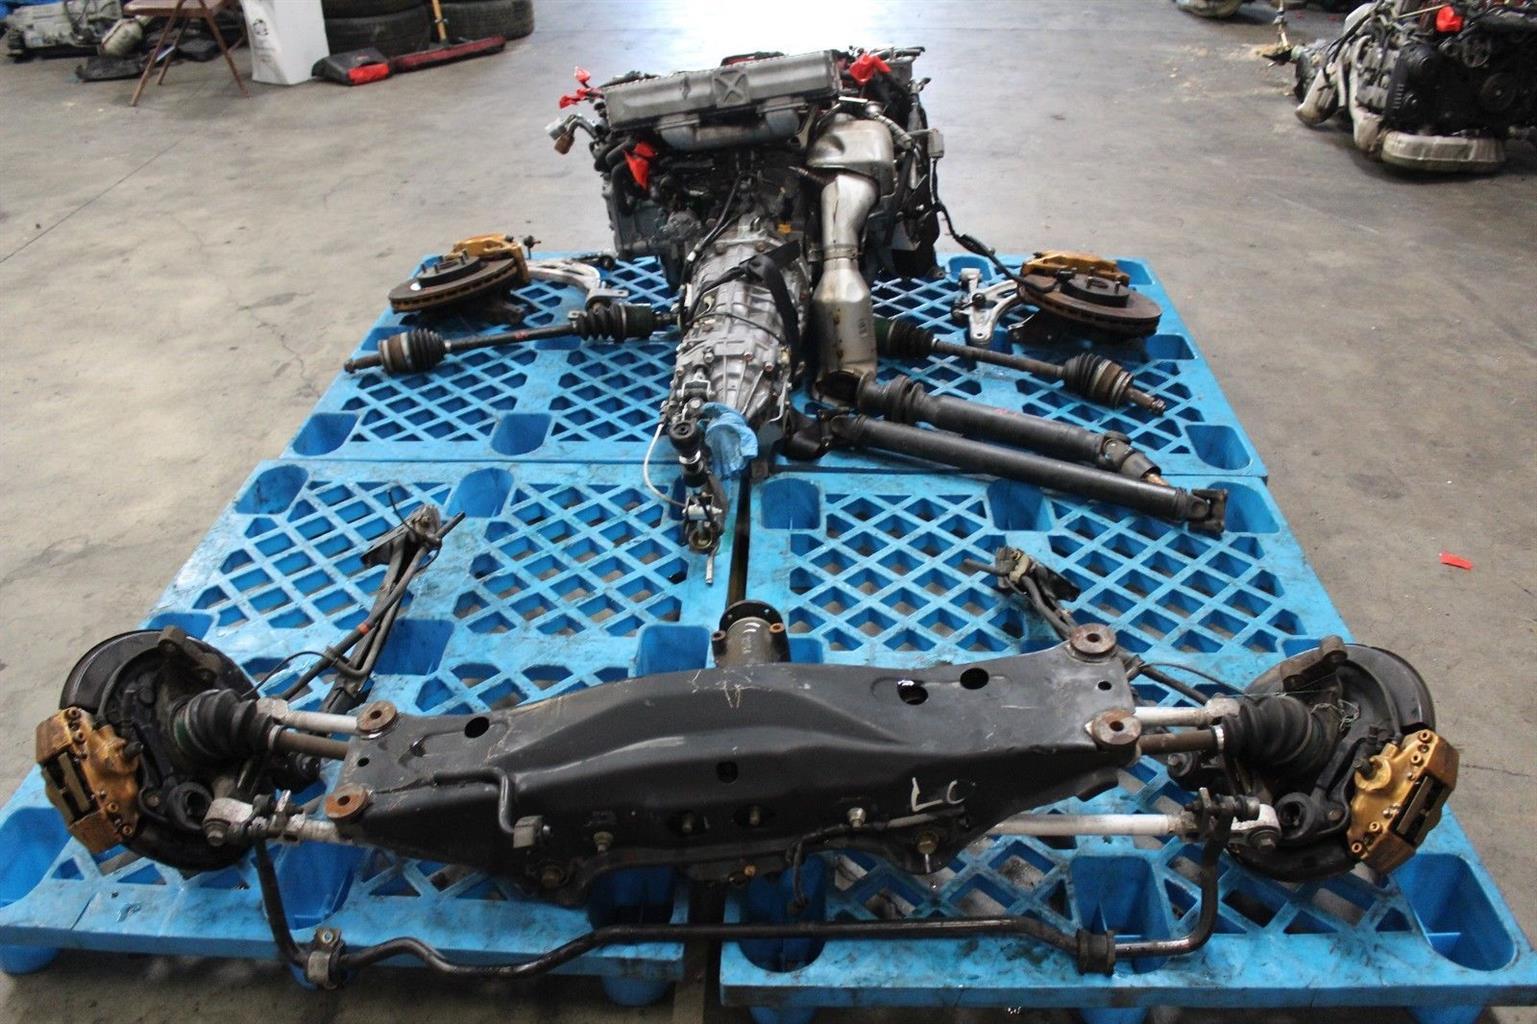 Subaru WRX STi 06 07 V9 EJ207 Turbo Engine DCCD Transmission Rear Diff Axles